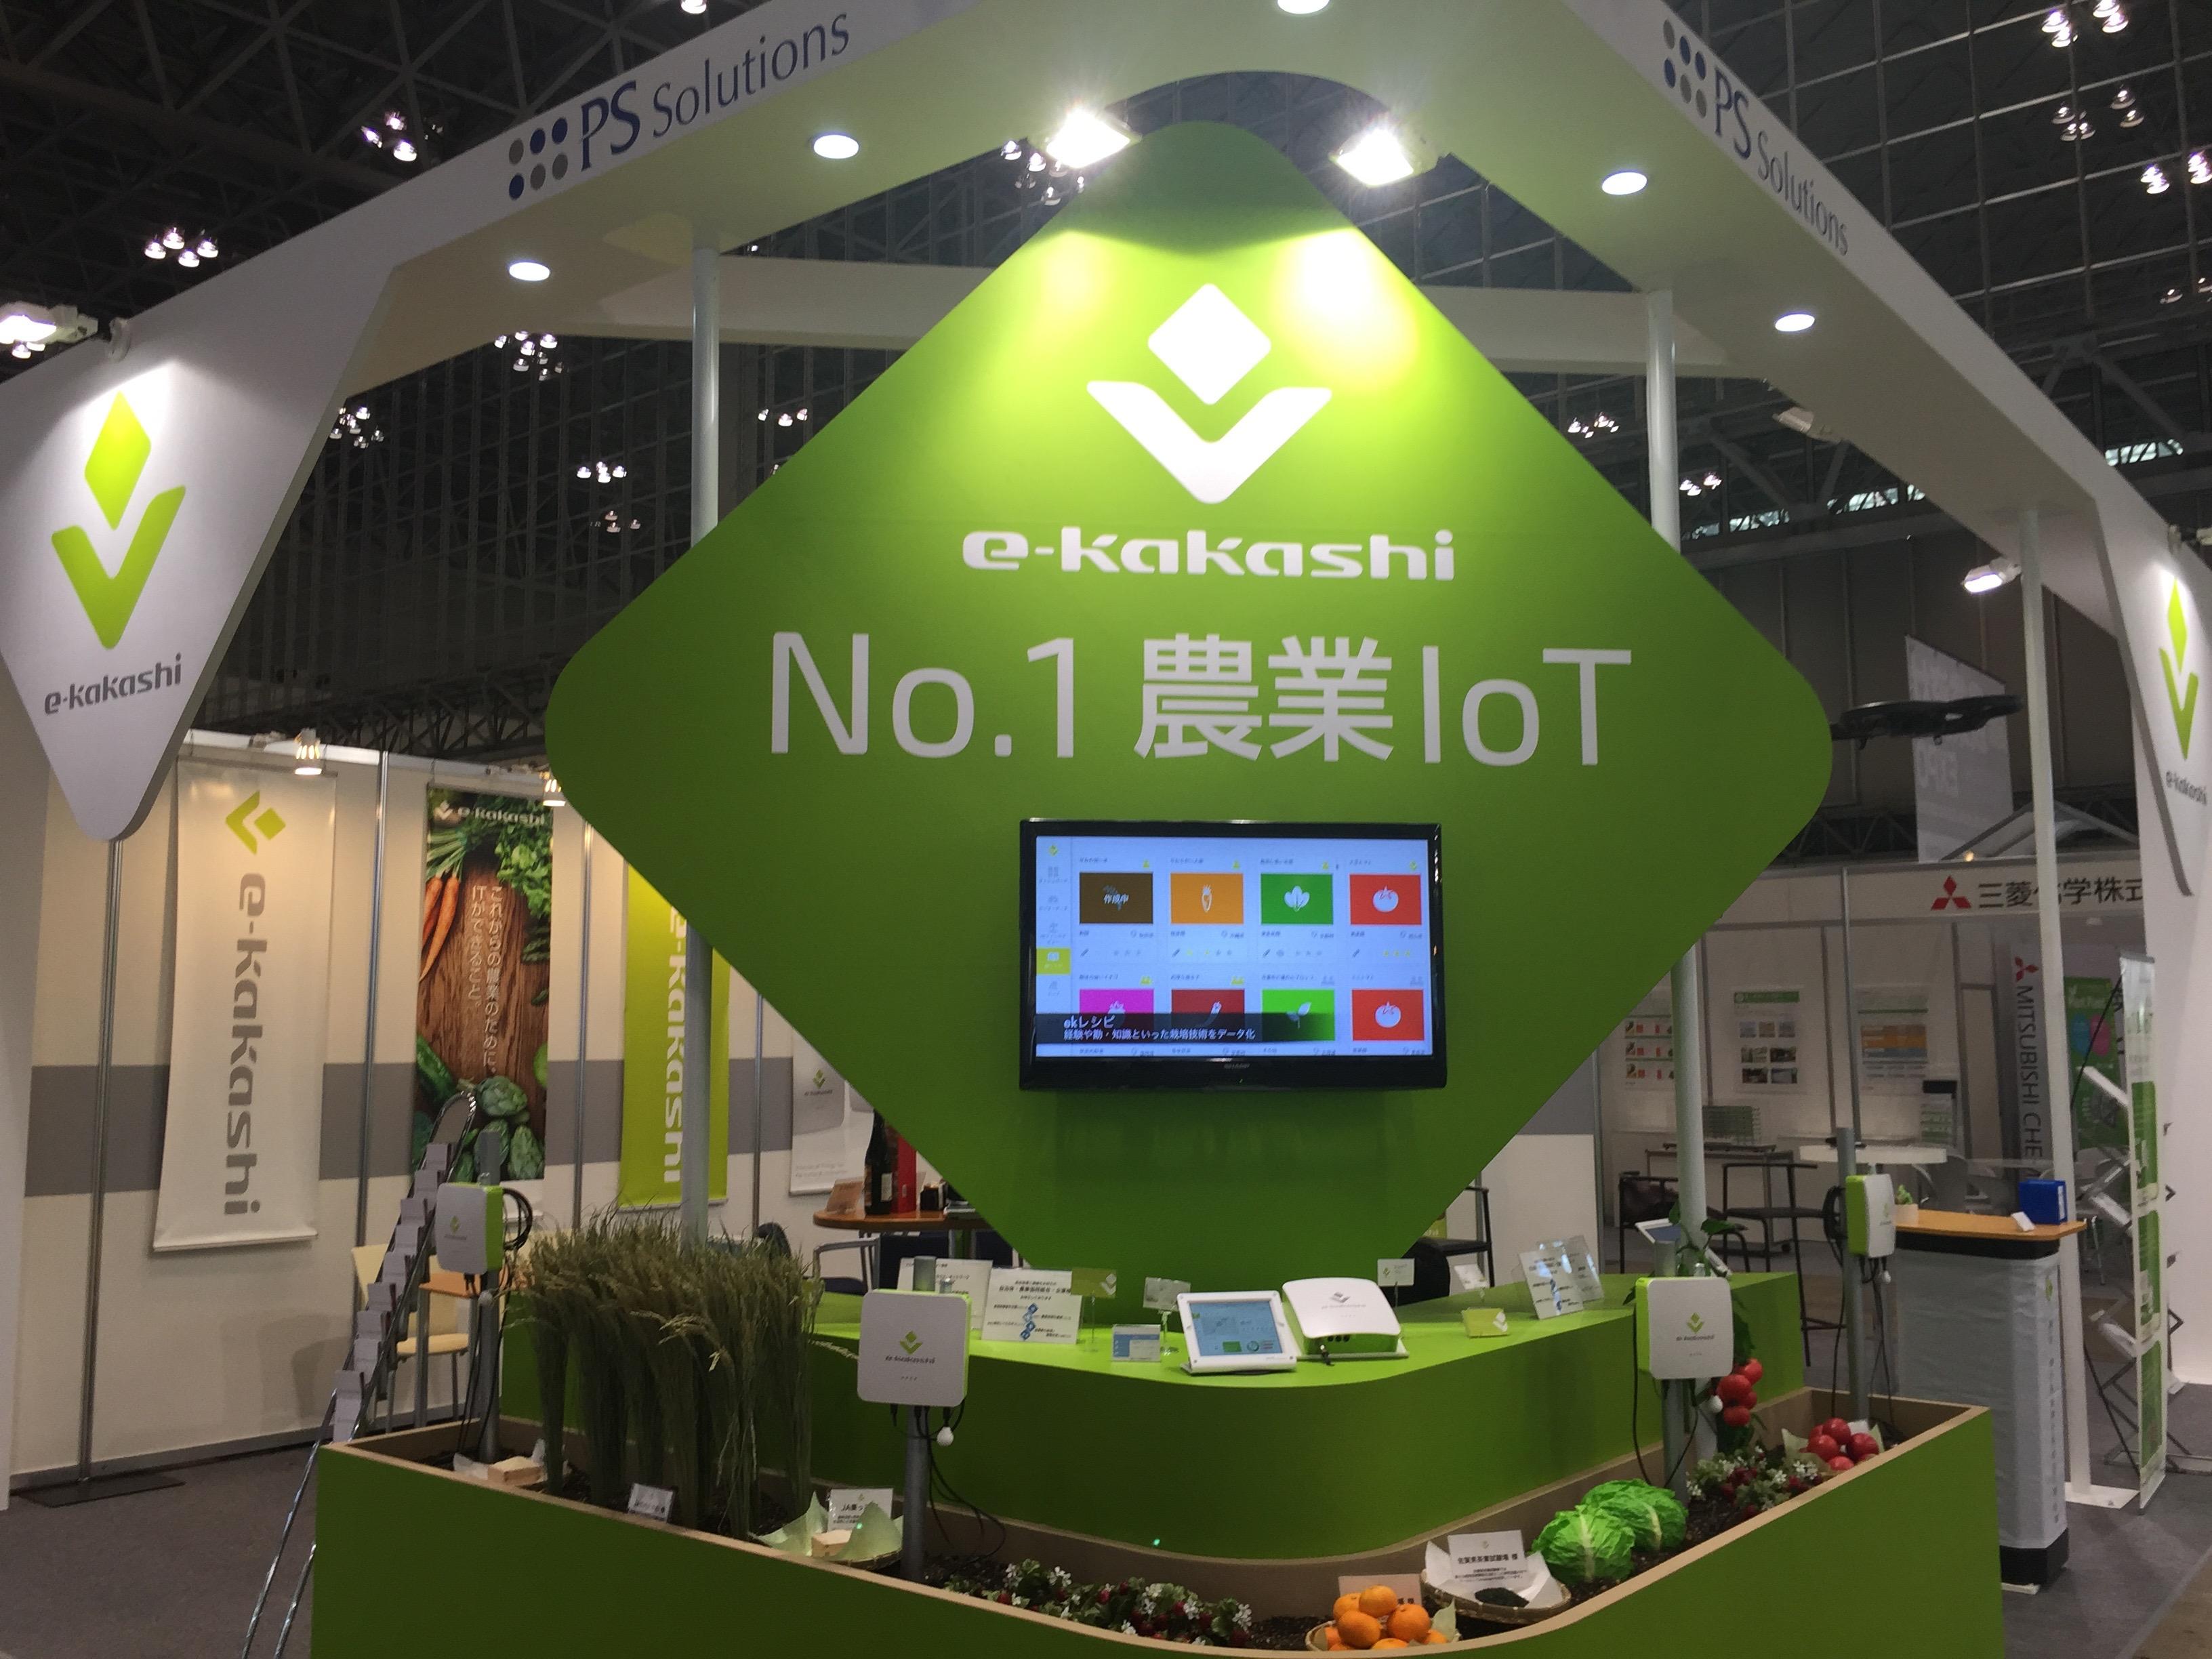 Newsニュース            日本最大の農業総合展「国際次世代農業EXPO」に 農業IoTソリューション「e-kakashi」が出展